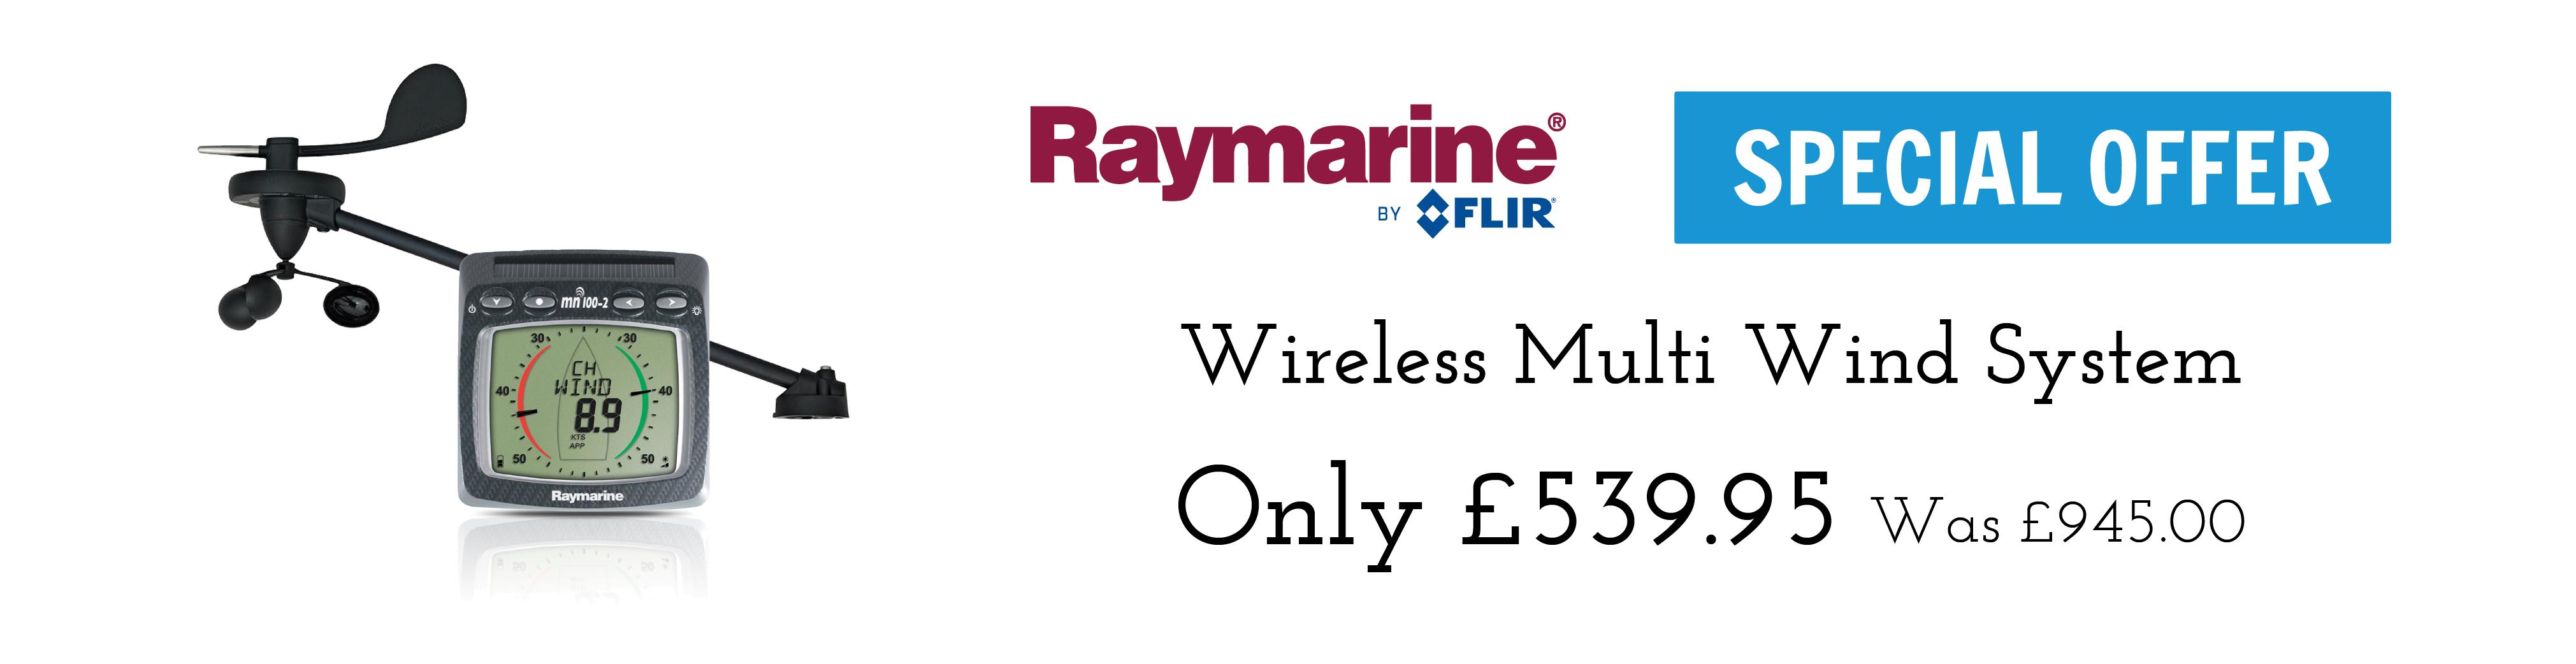 raymarine wireless multi wind instrument system special offer banner